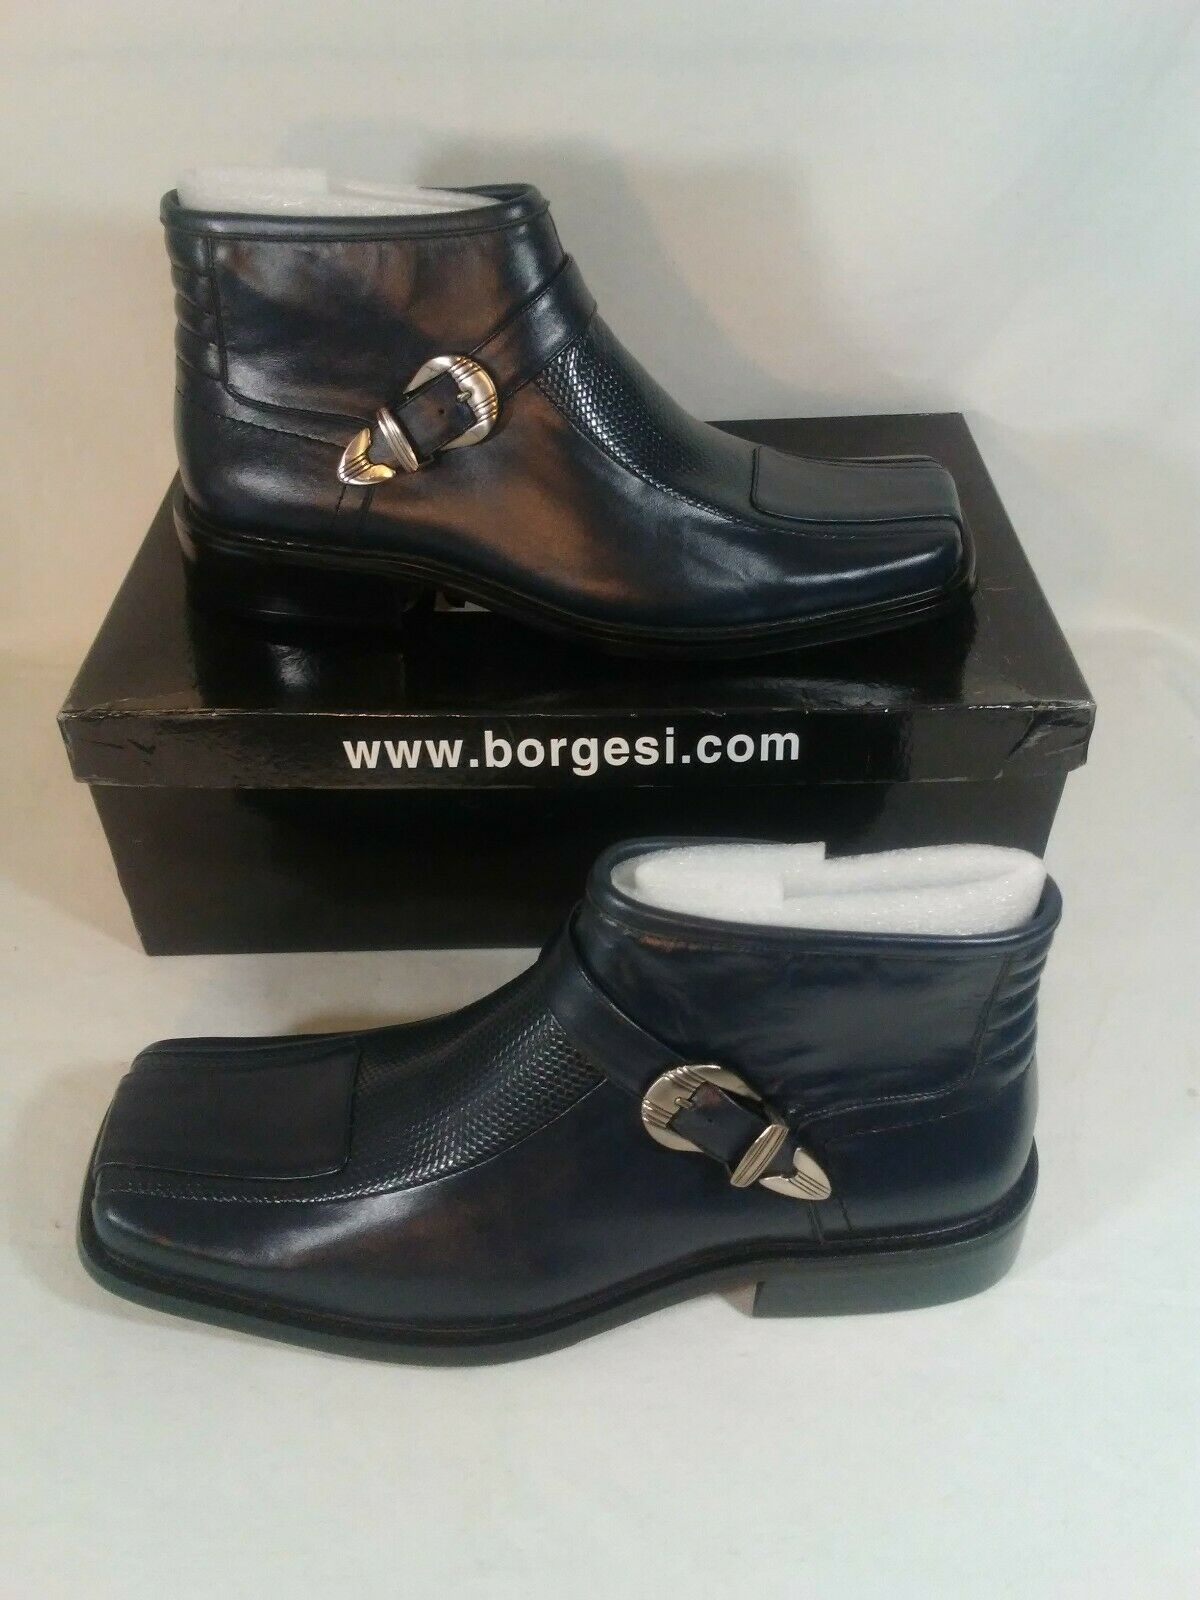 Borgesi botas al Tobillo Para Hombre Negro